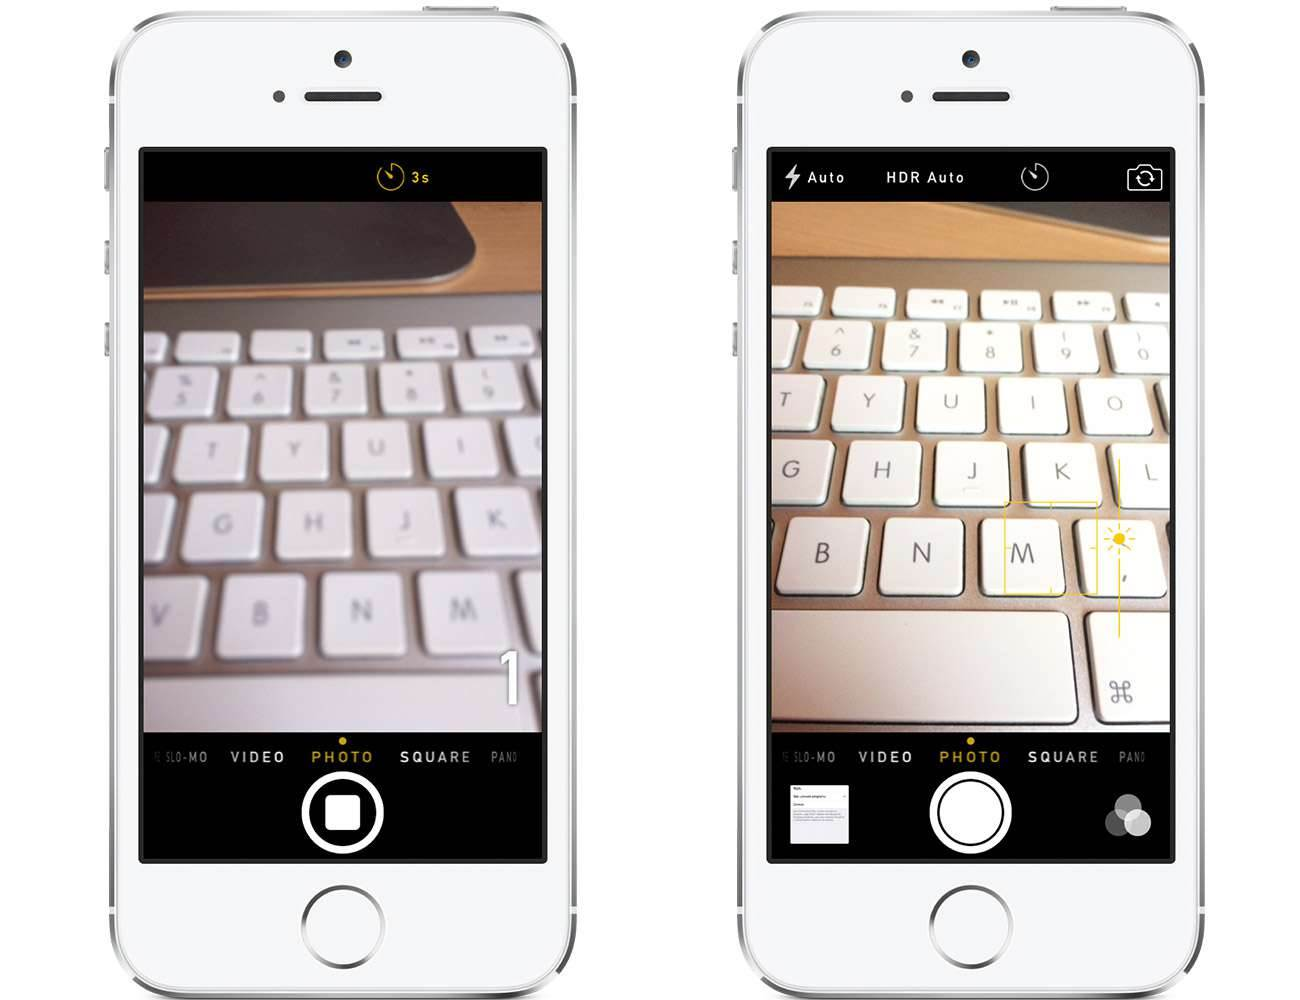 iOS8.Aparat1.onetech.pl